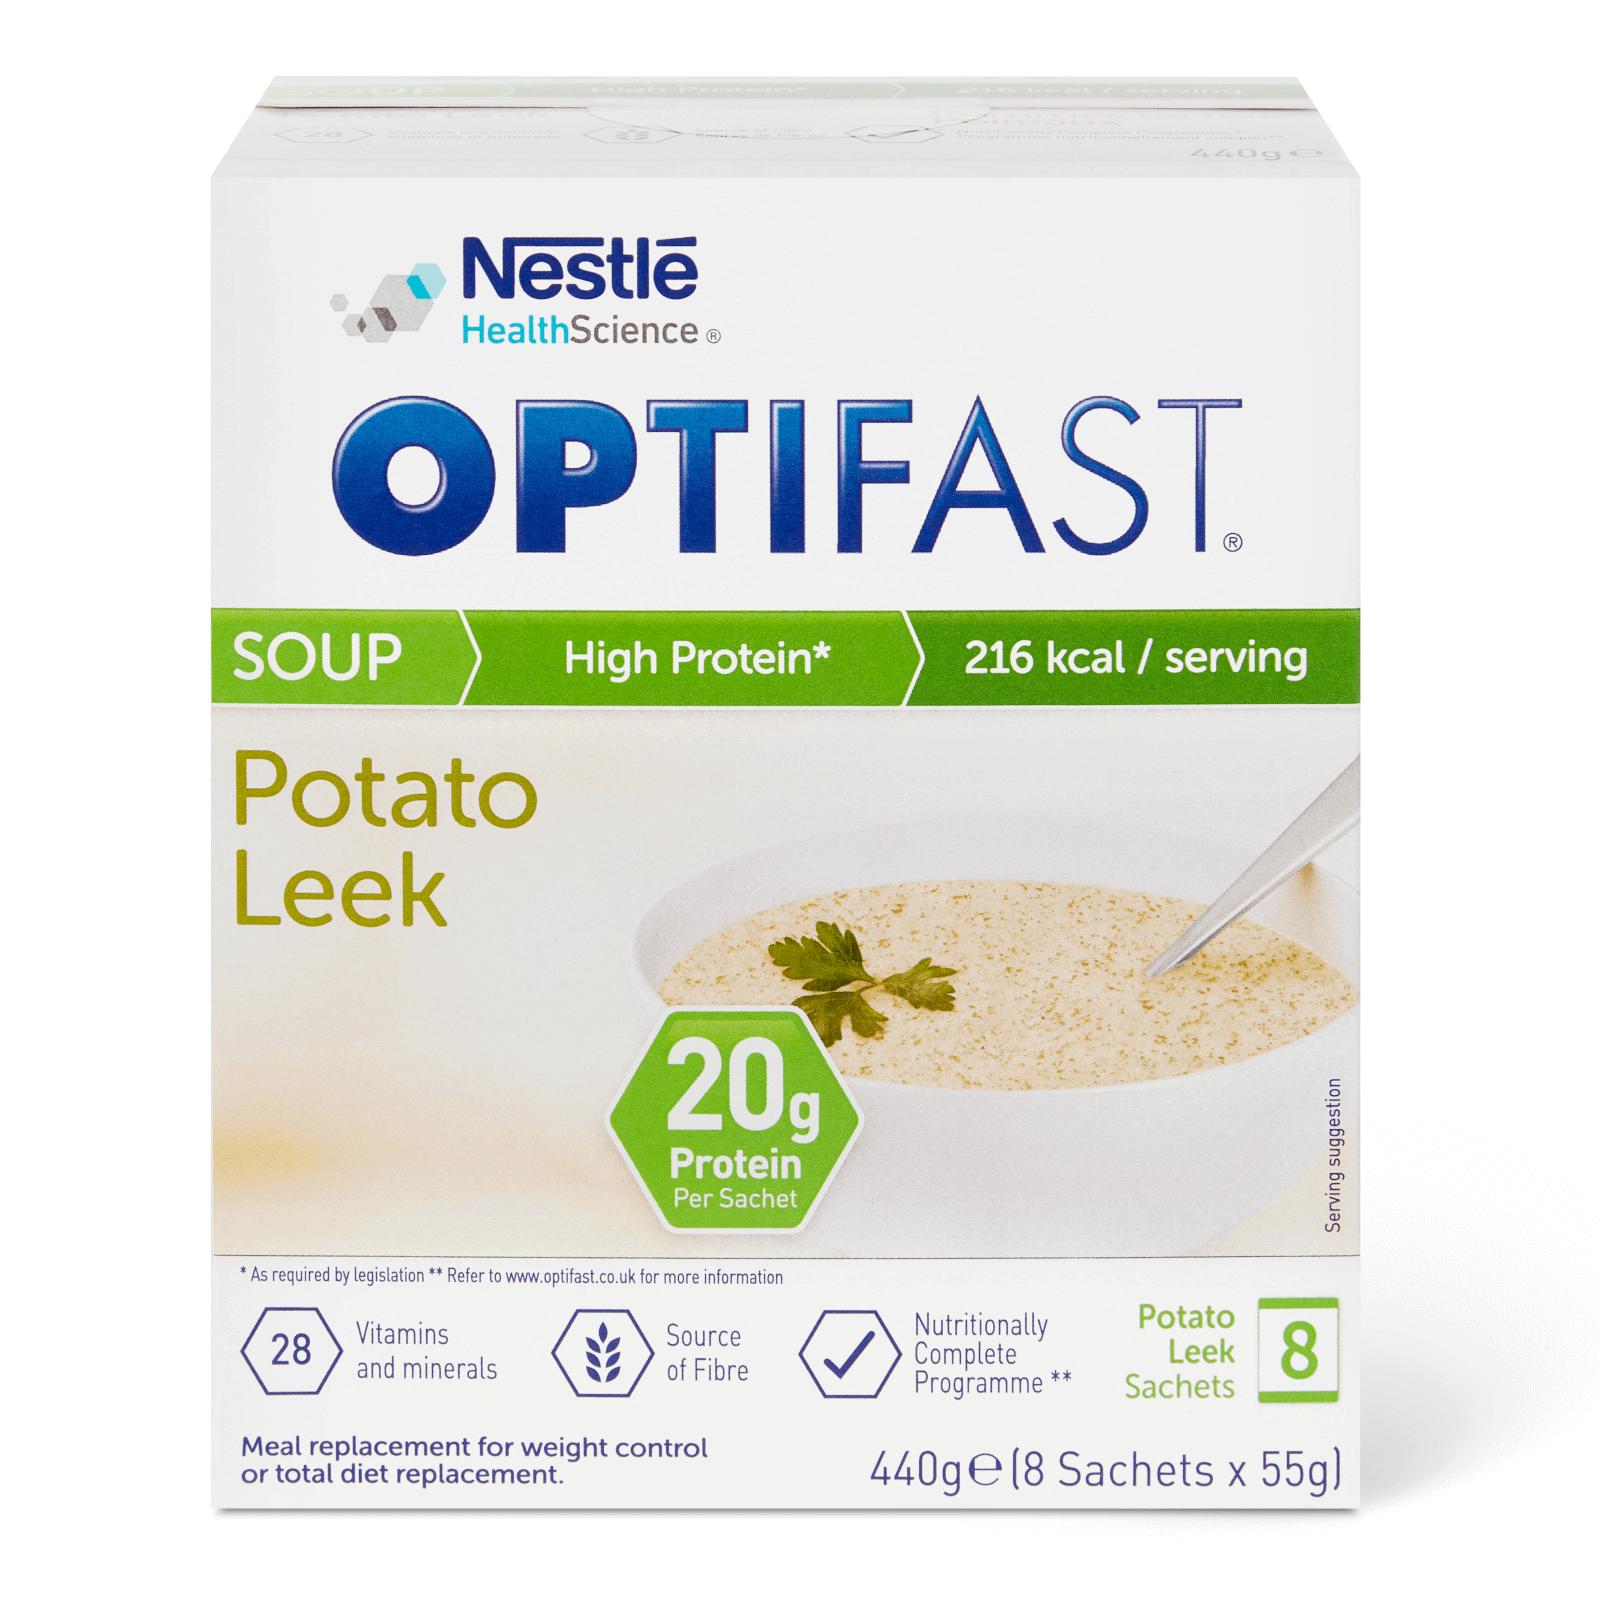 Image of the Leek & Potato flavour OPTIFAST soup